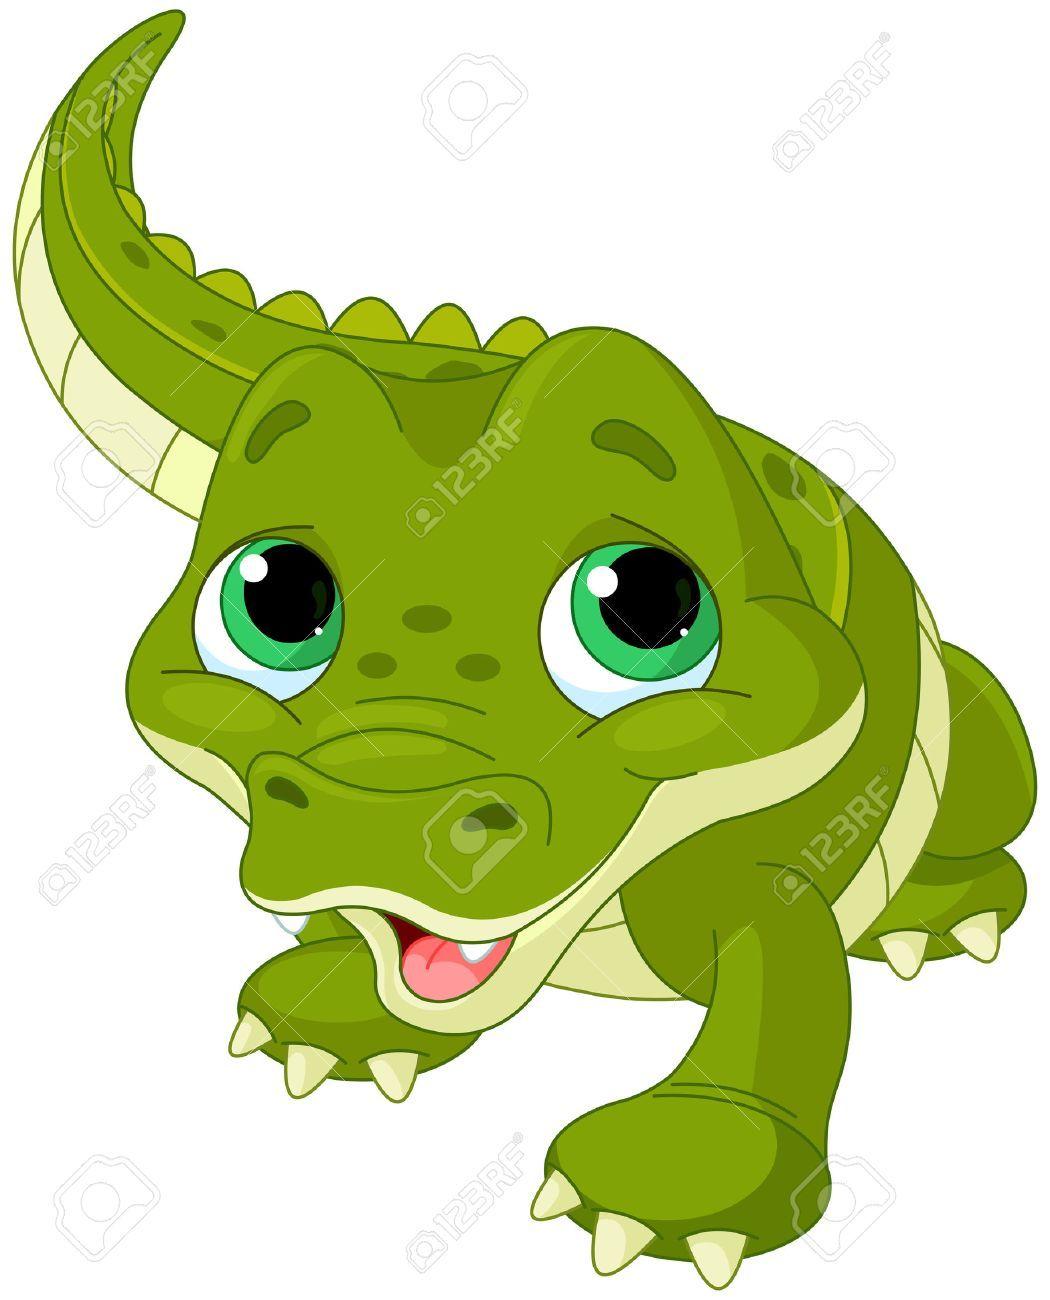 Cute alligator clipart 9 » Clipart Portal.